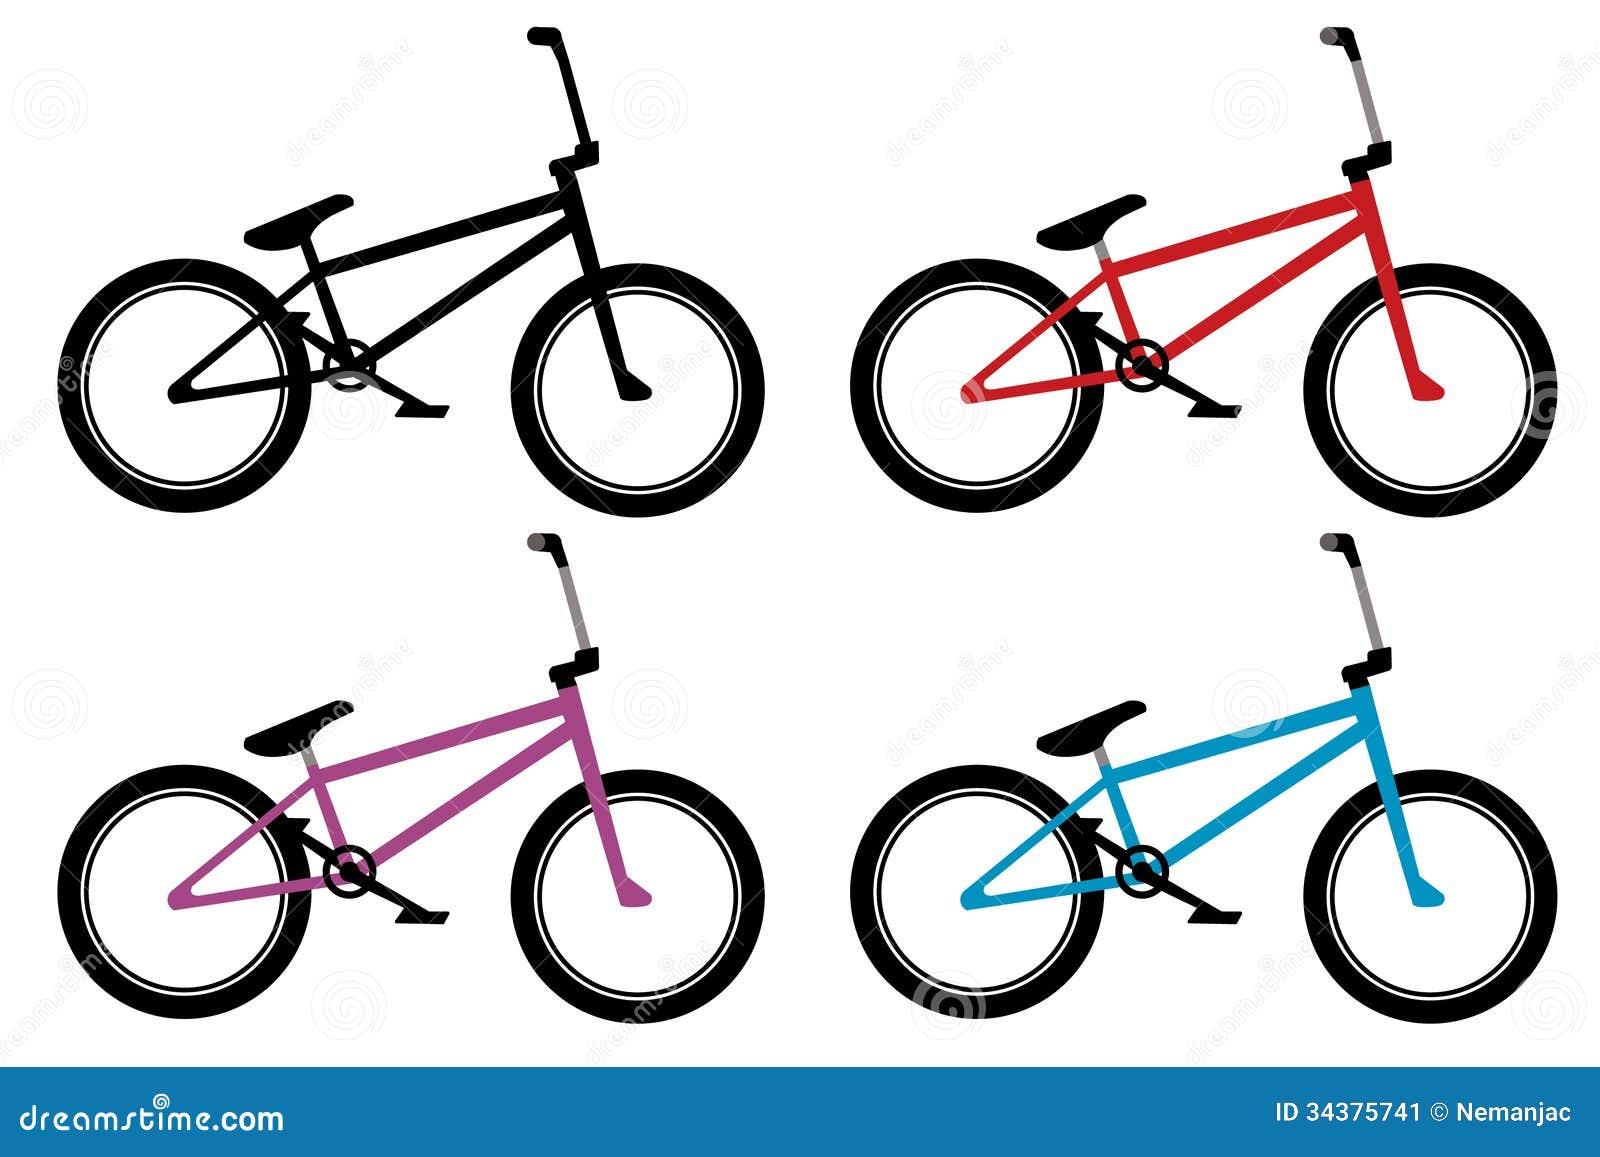 Bmx bike set stock vector. Illustration of biking, pedal ...